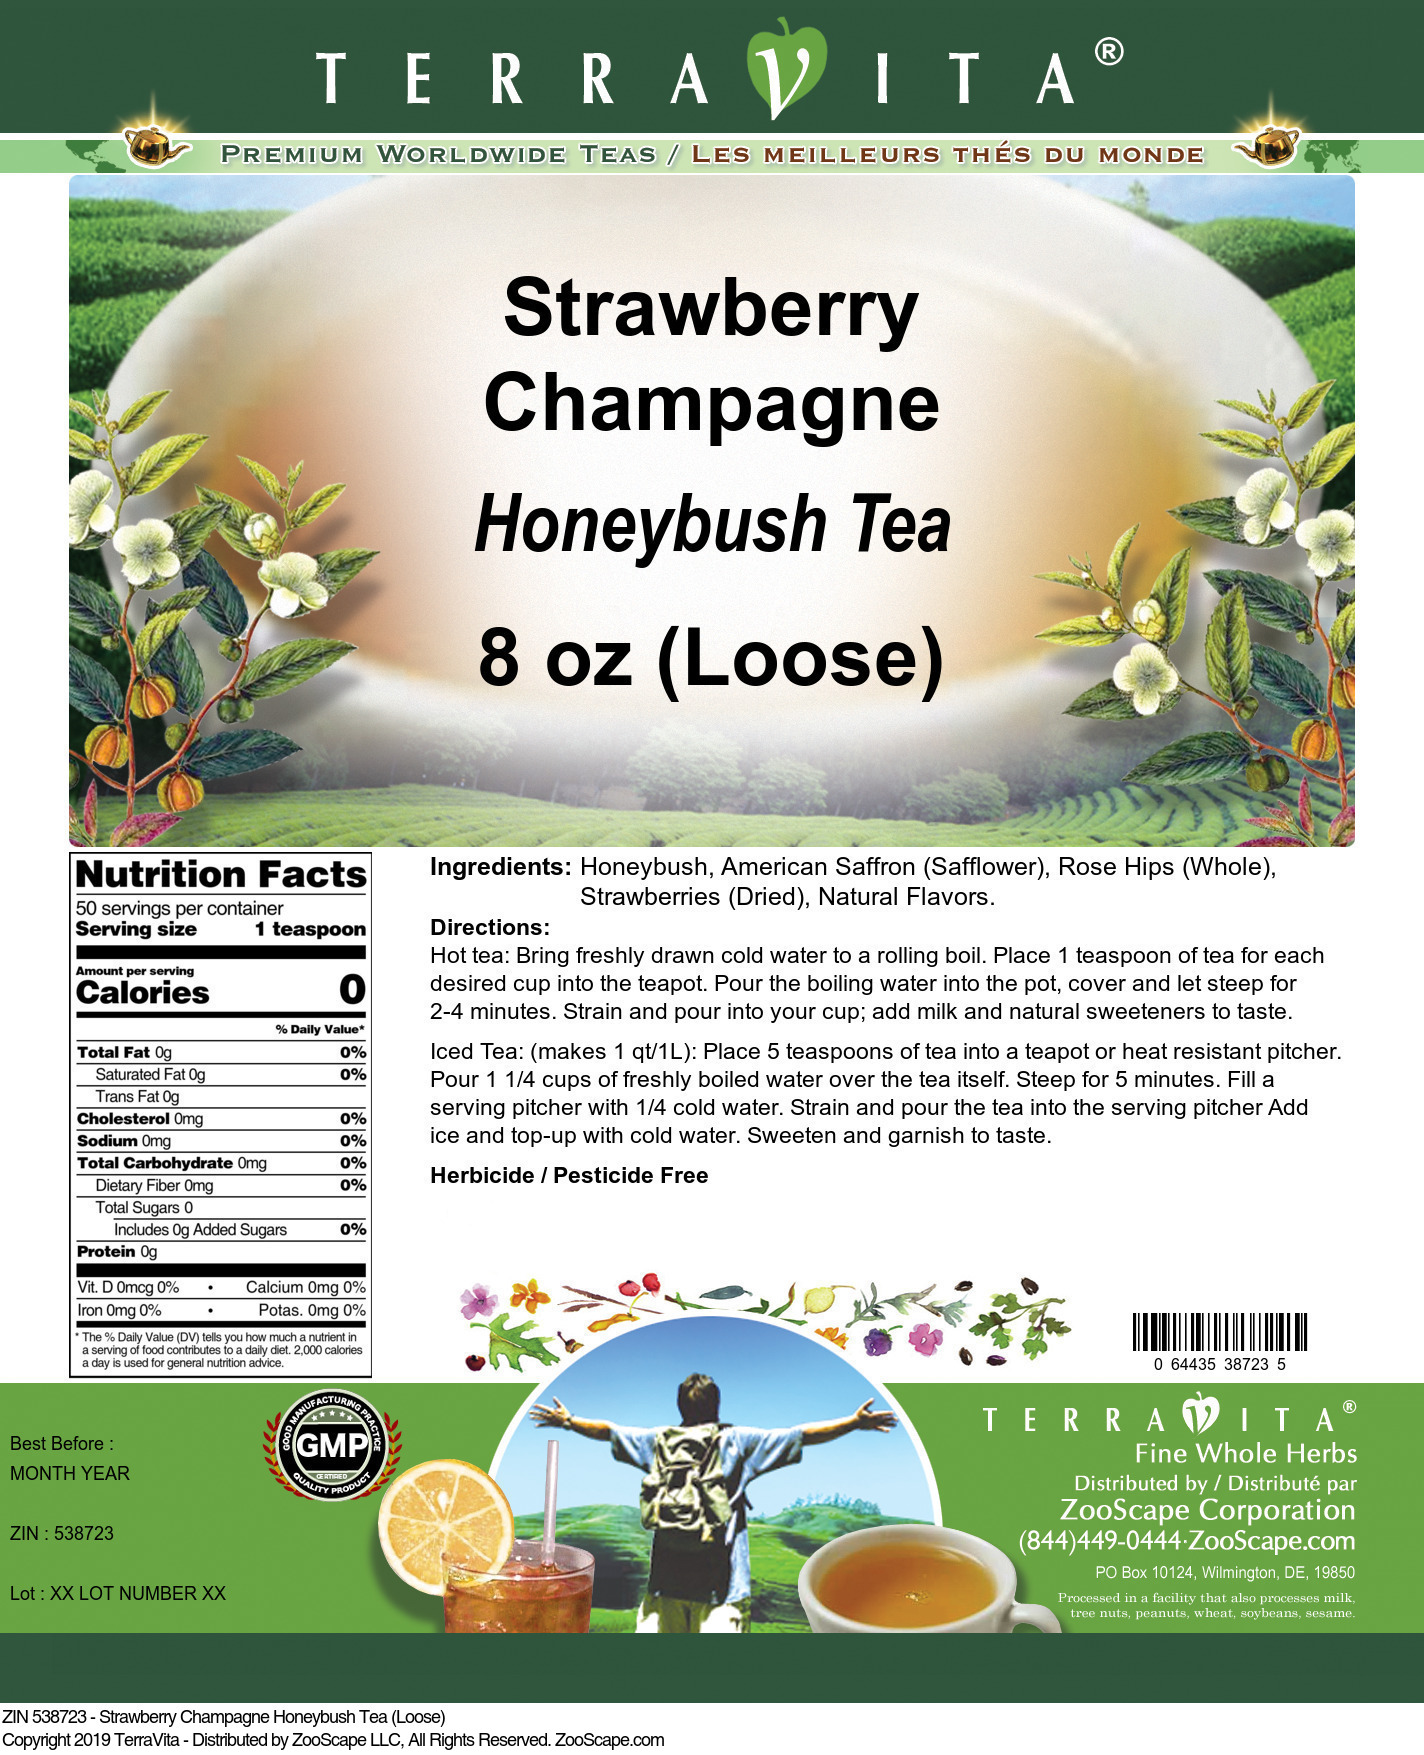 Strawberry Champagne Honeybush Tea